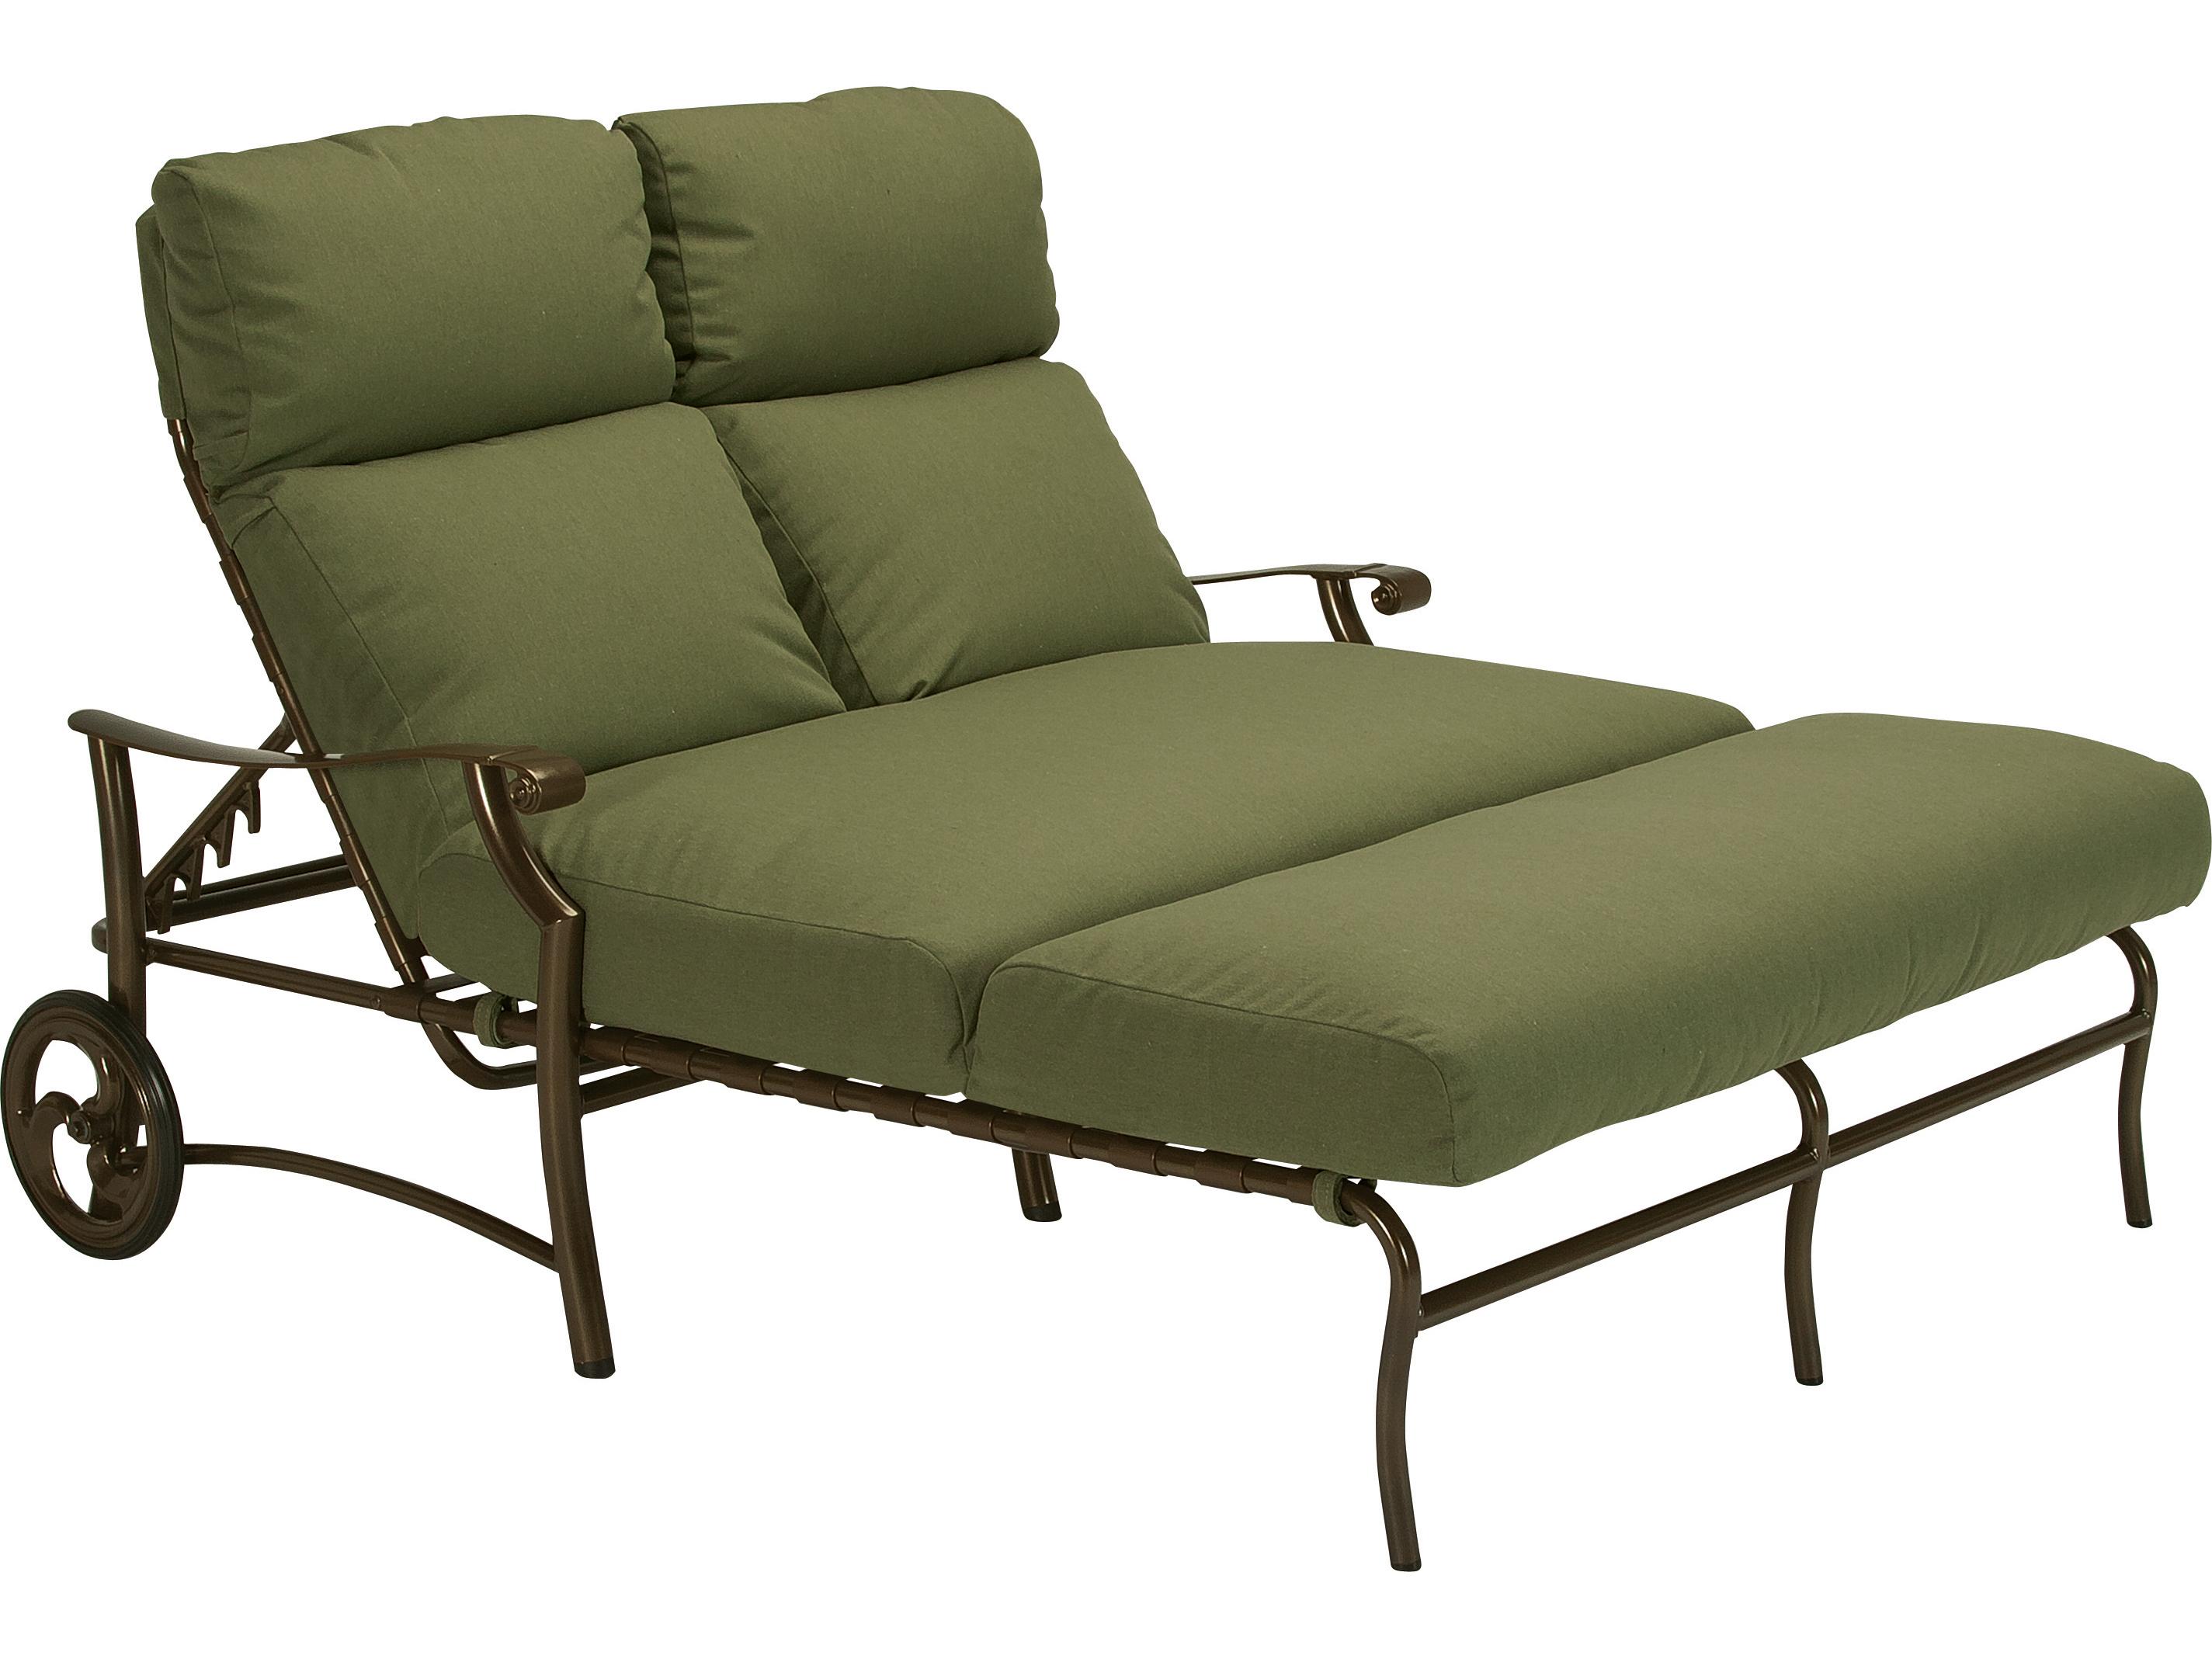 Tropitone Montreux Ii Relaxplus Replacement Cushion ...